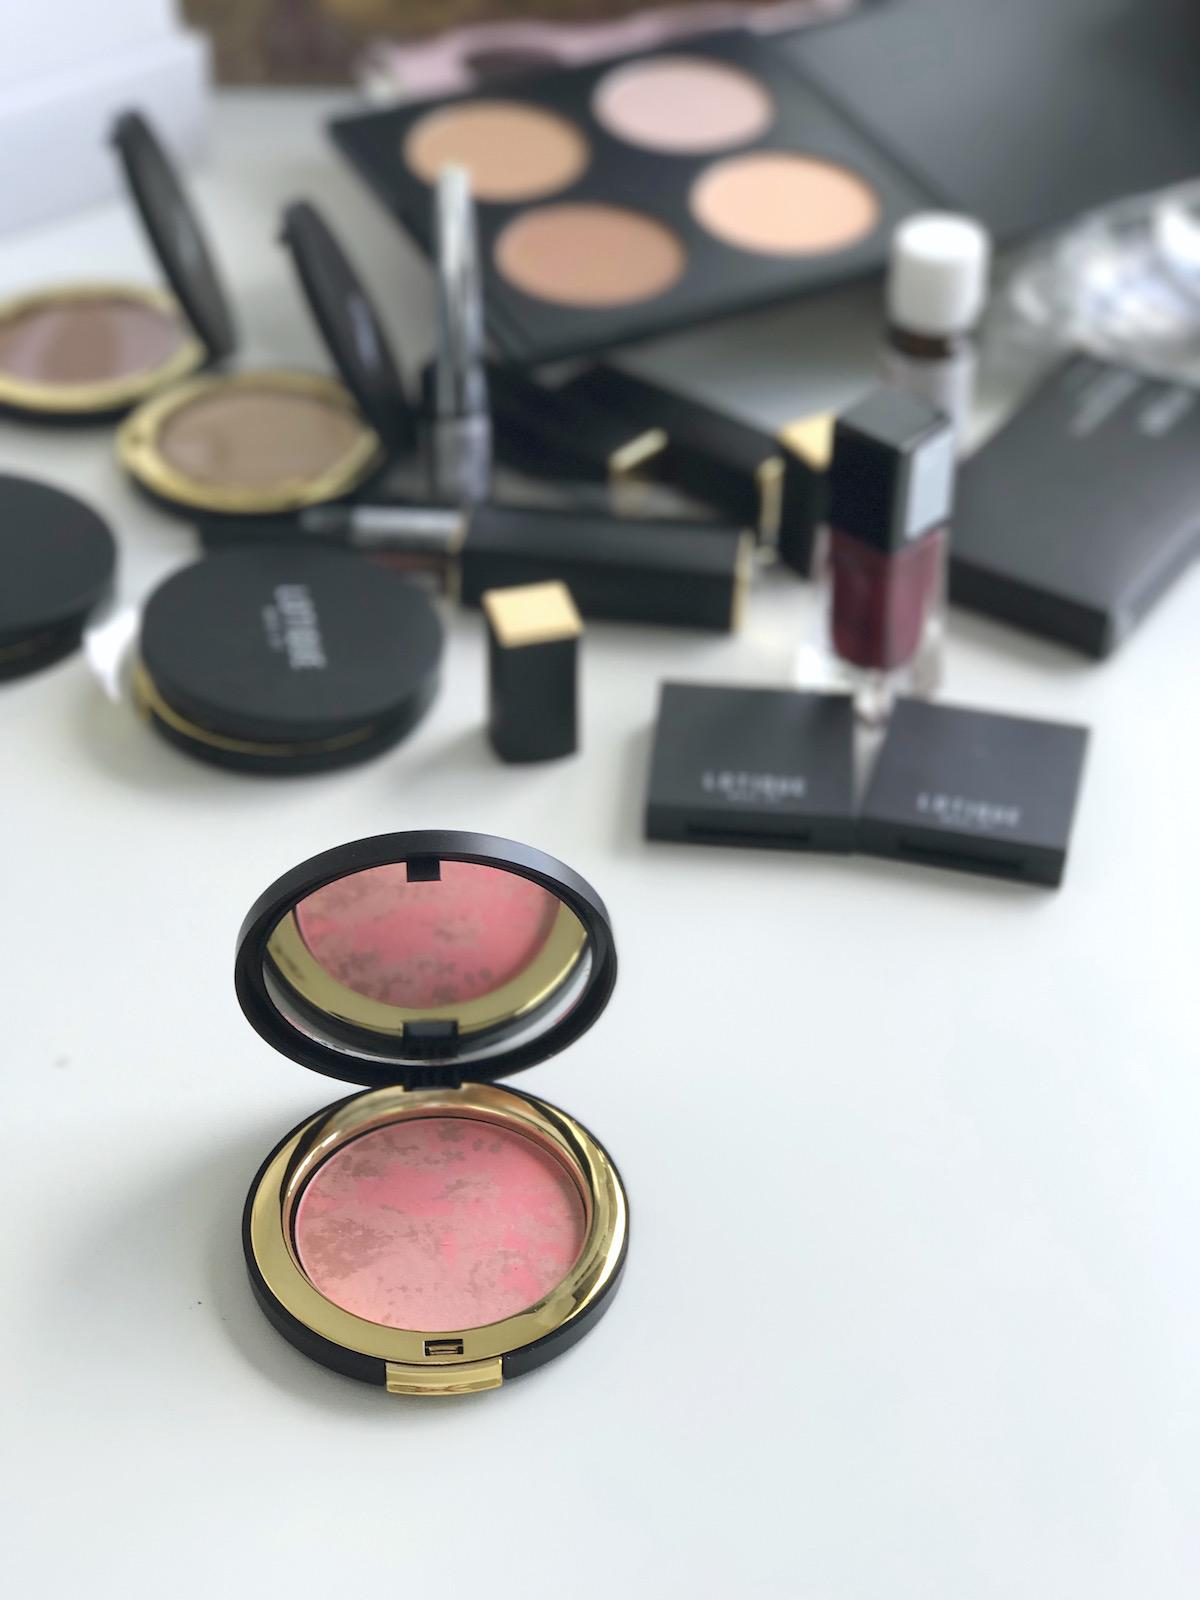 lotique makeup ličila beautyfullblog